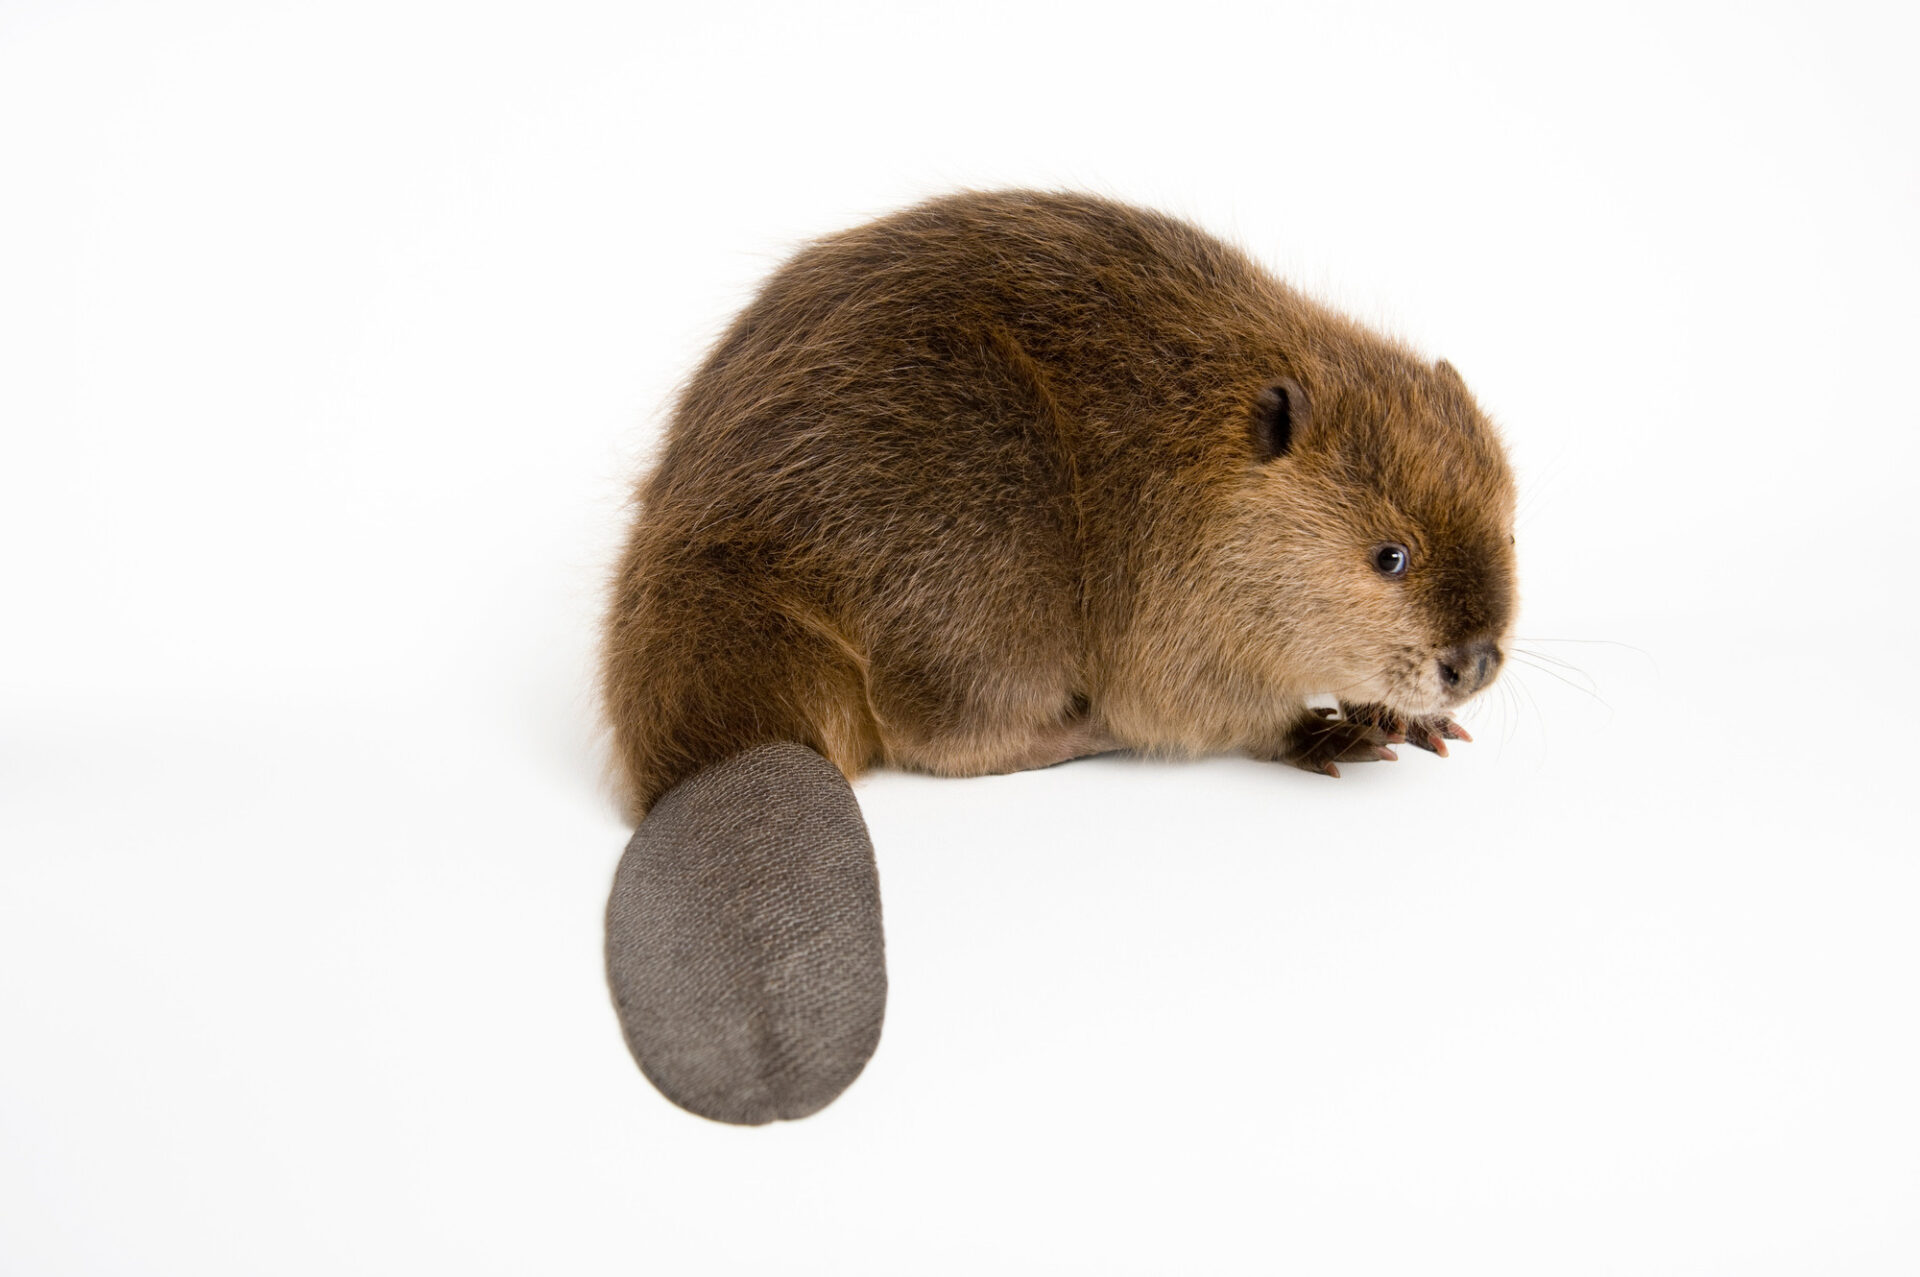 A North American beaver (Castor canadensis).